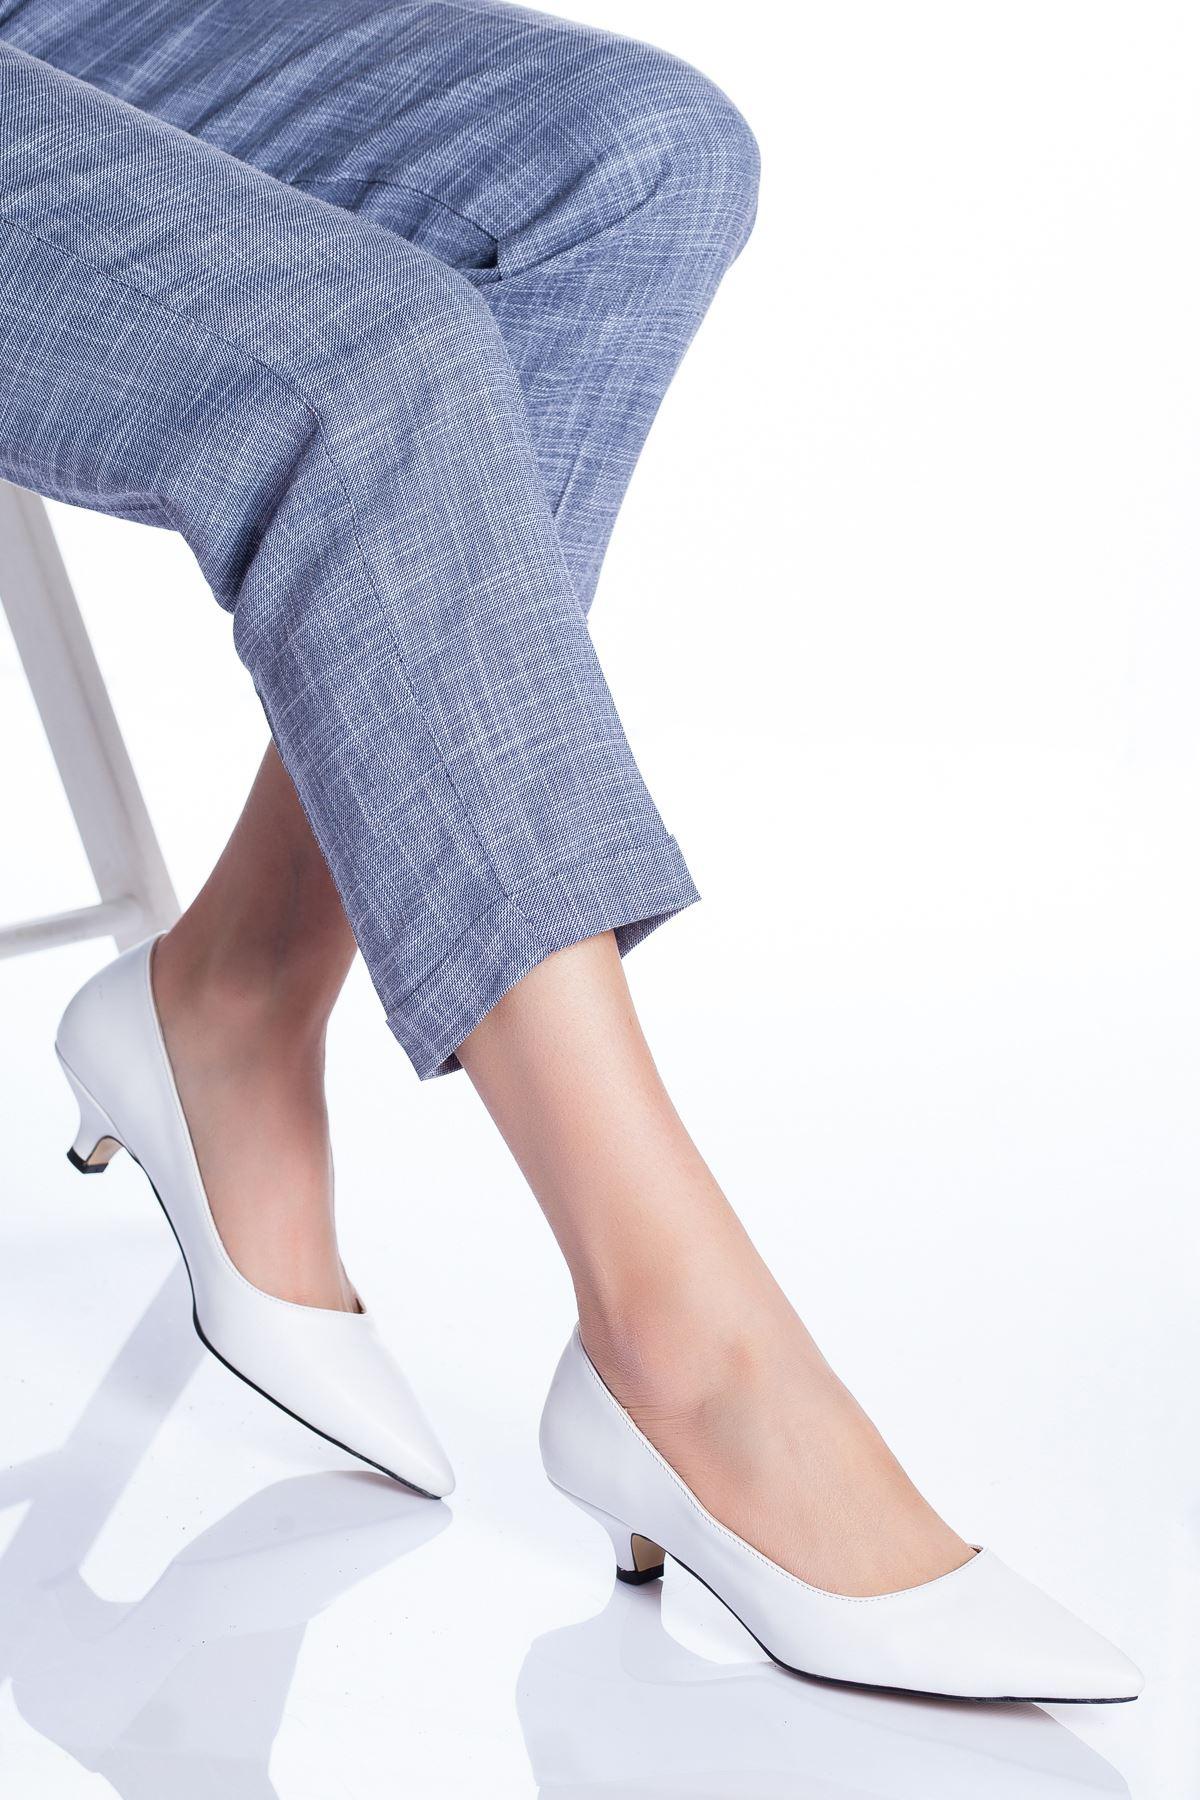 Odella Topuklu Ayakkabı BEYAZ CİLT